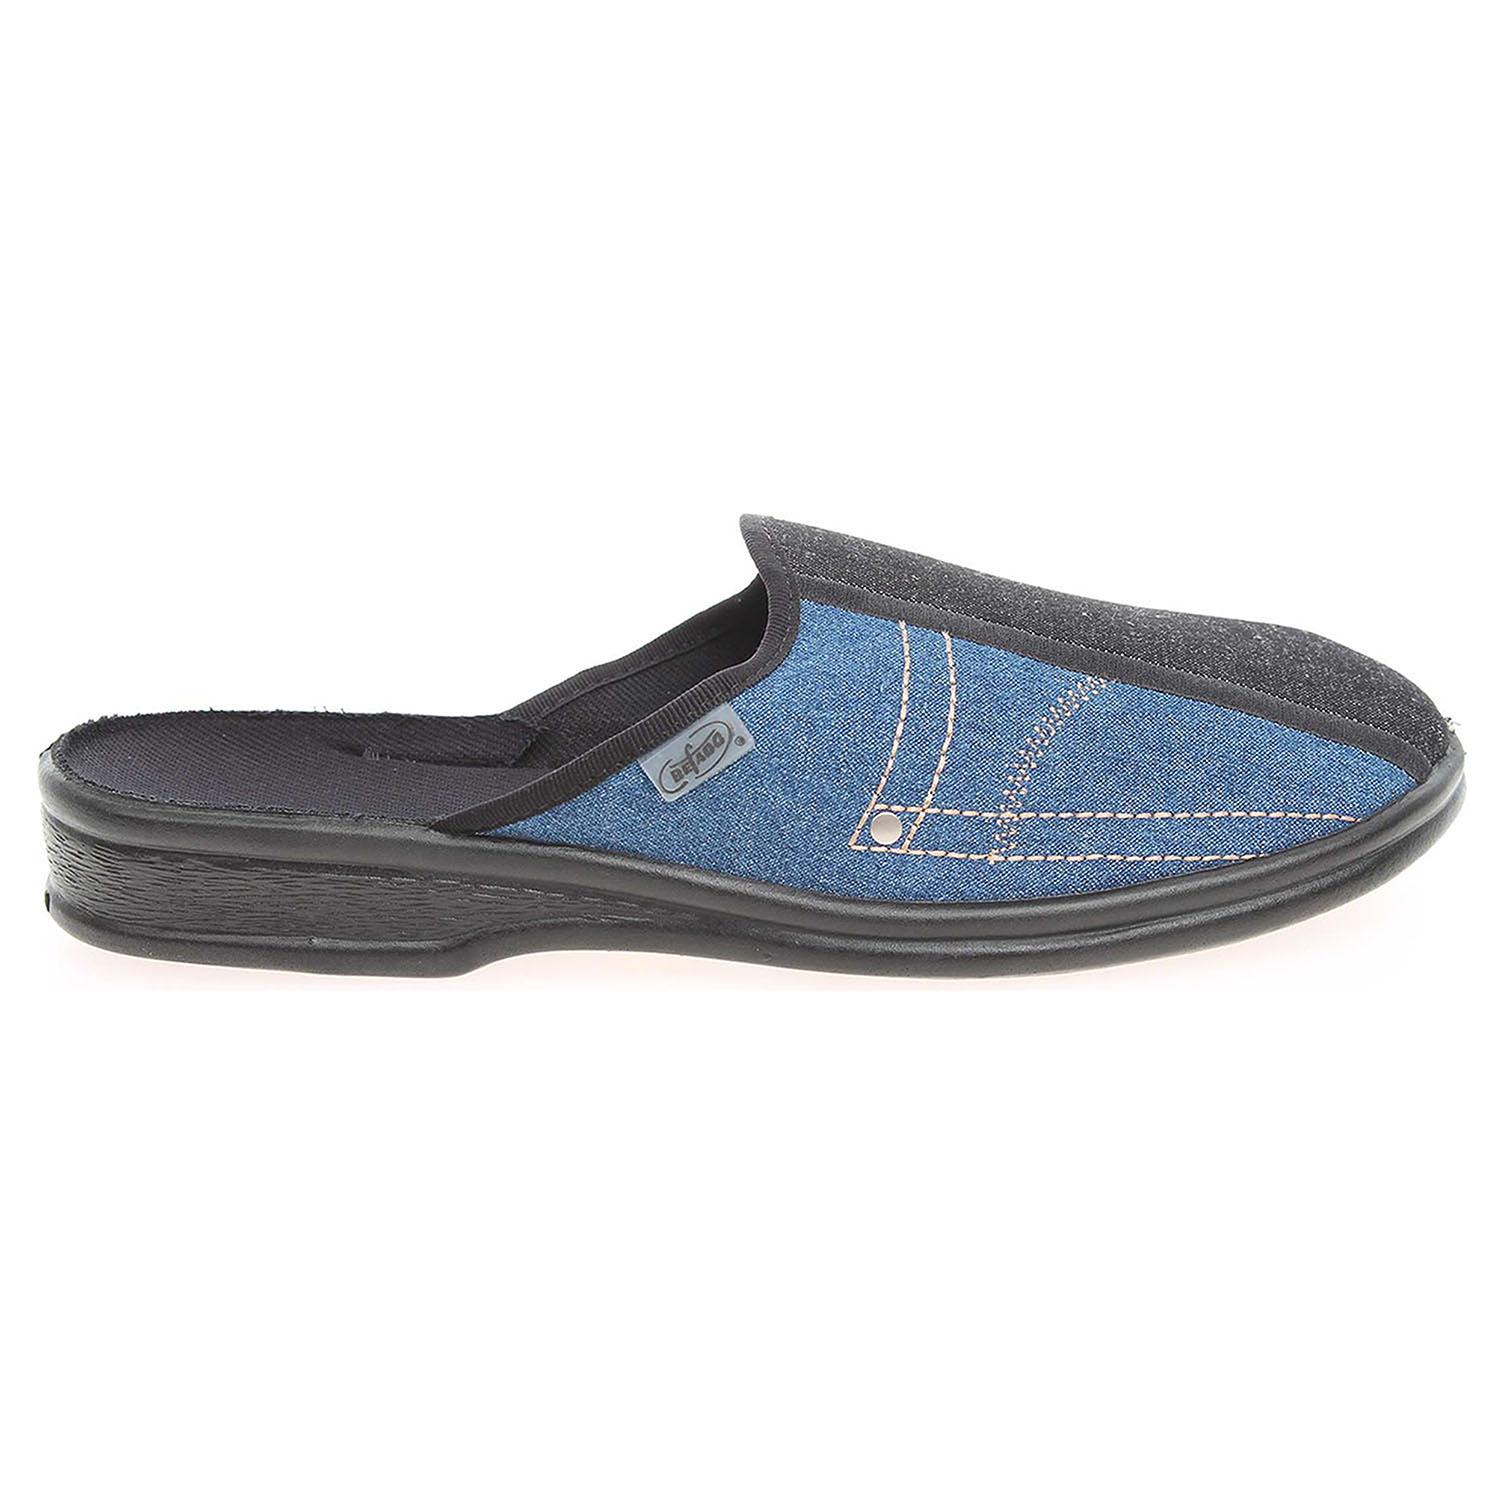 Ecco Befado pánské domácí pantofle 093M035 modré 24800239